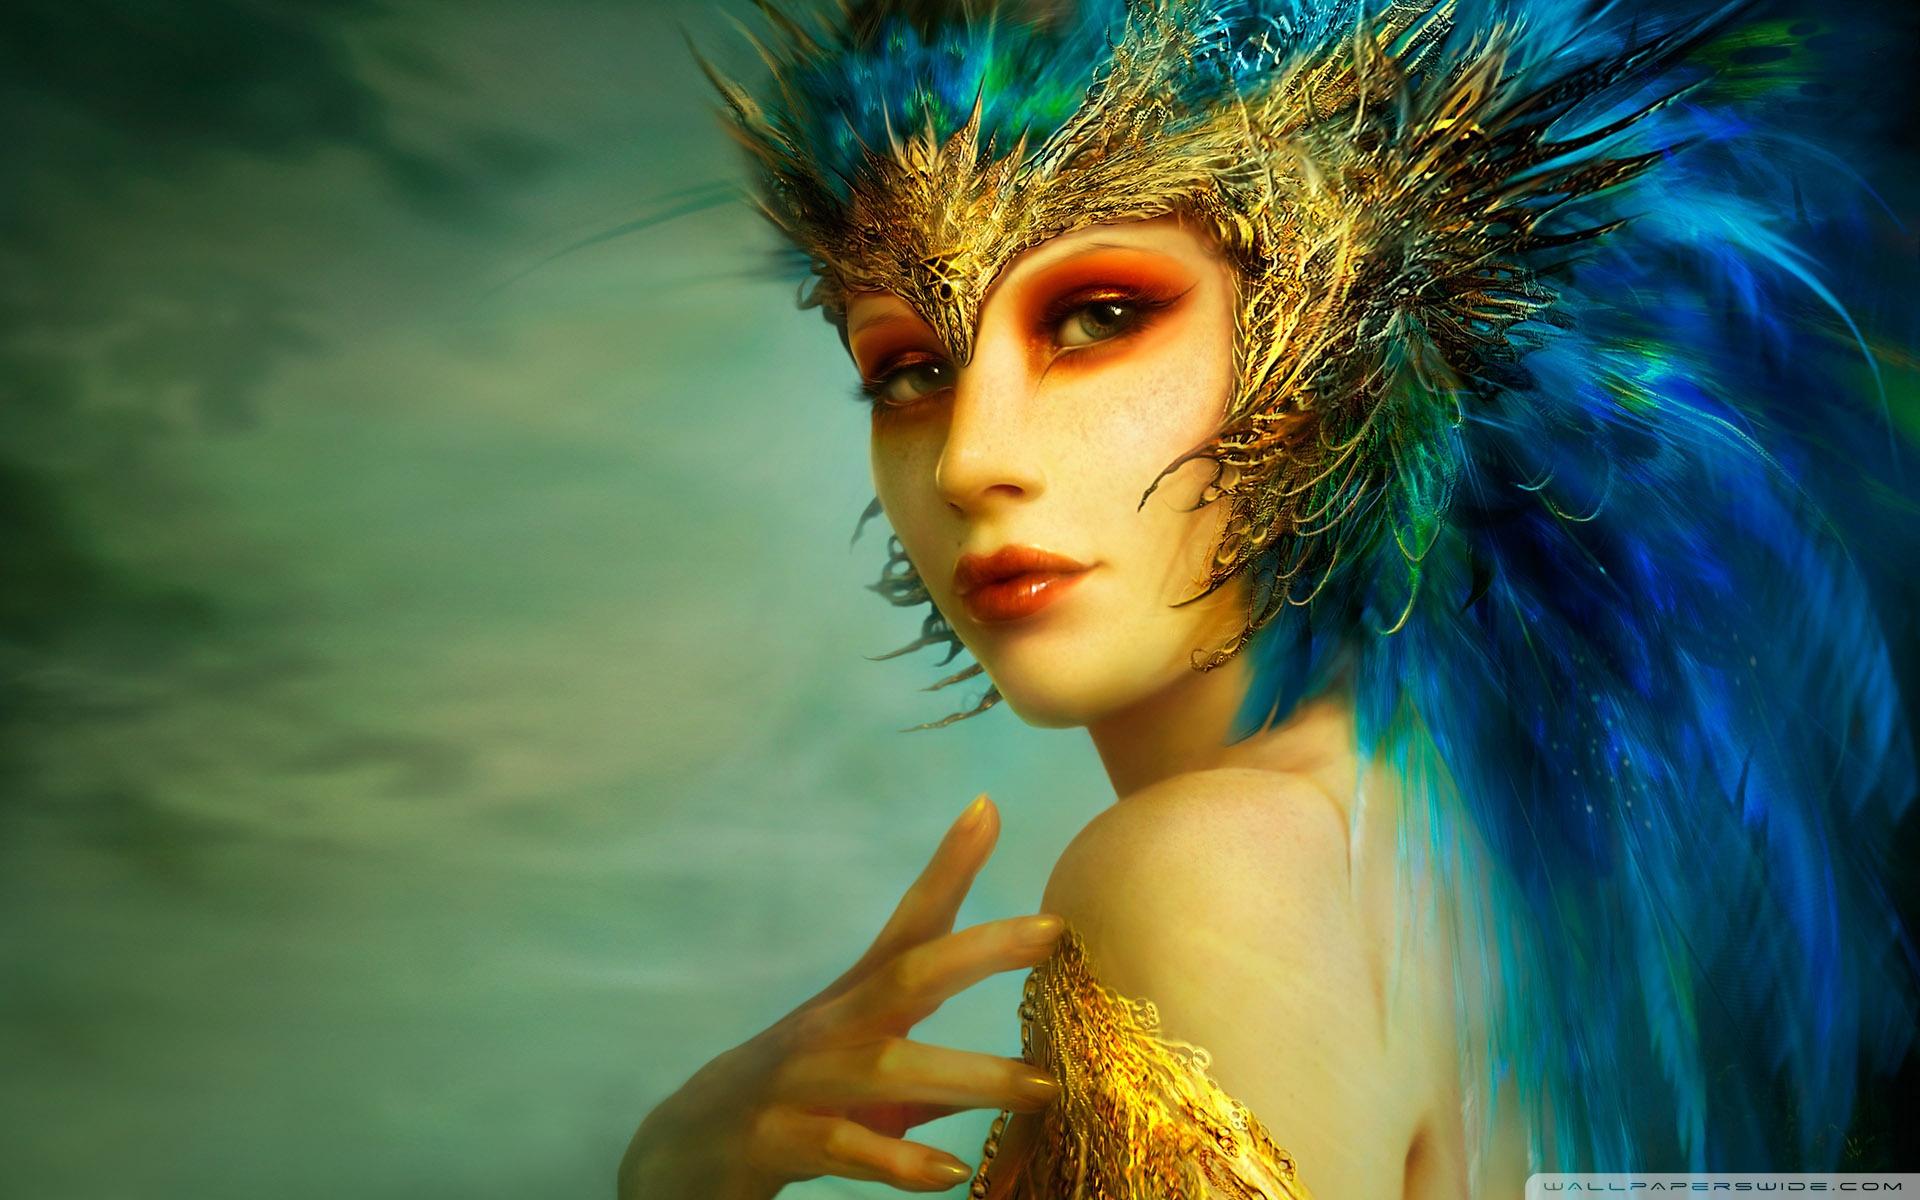 Fantasy Girl HD desktop wallpaper : High Definition : Fullscreen